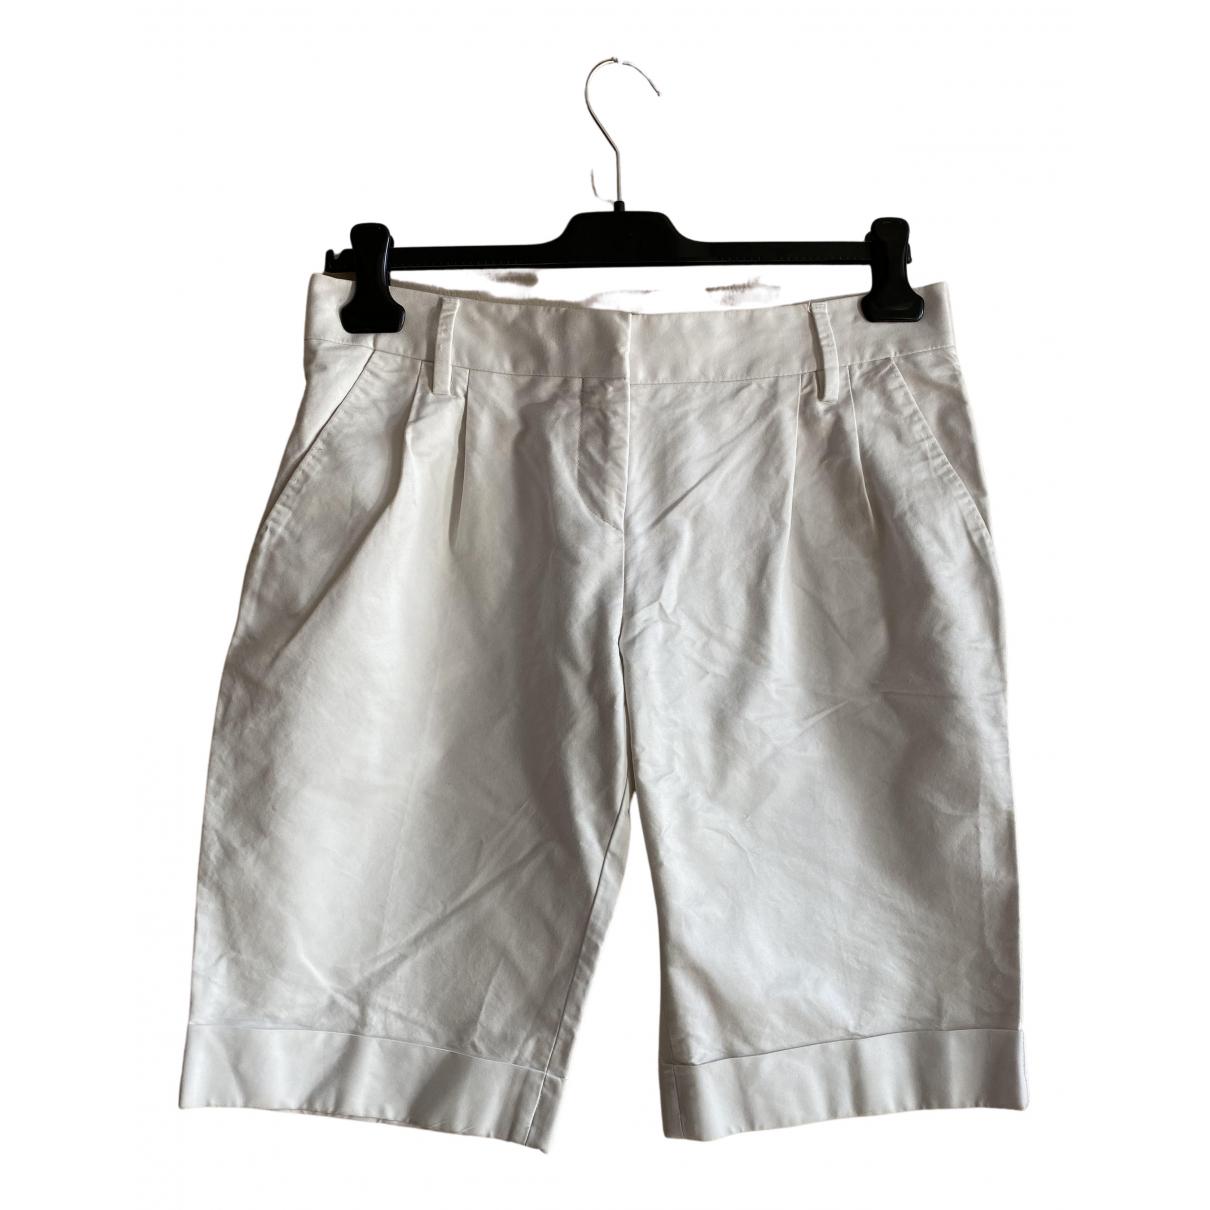 D&g \N Shorts in  Weiss Baumwolle